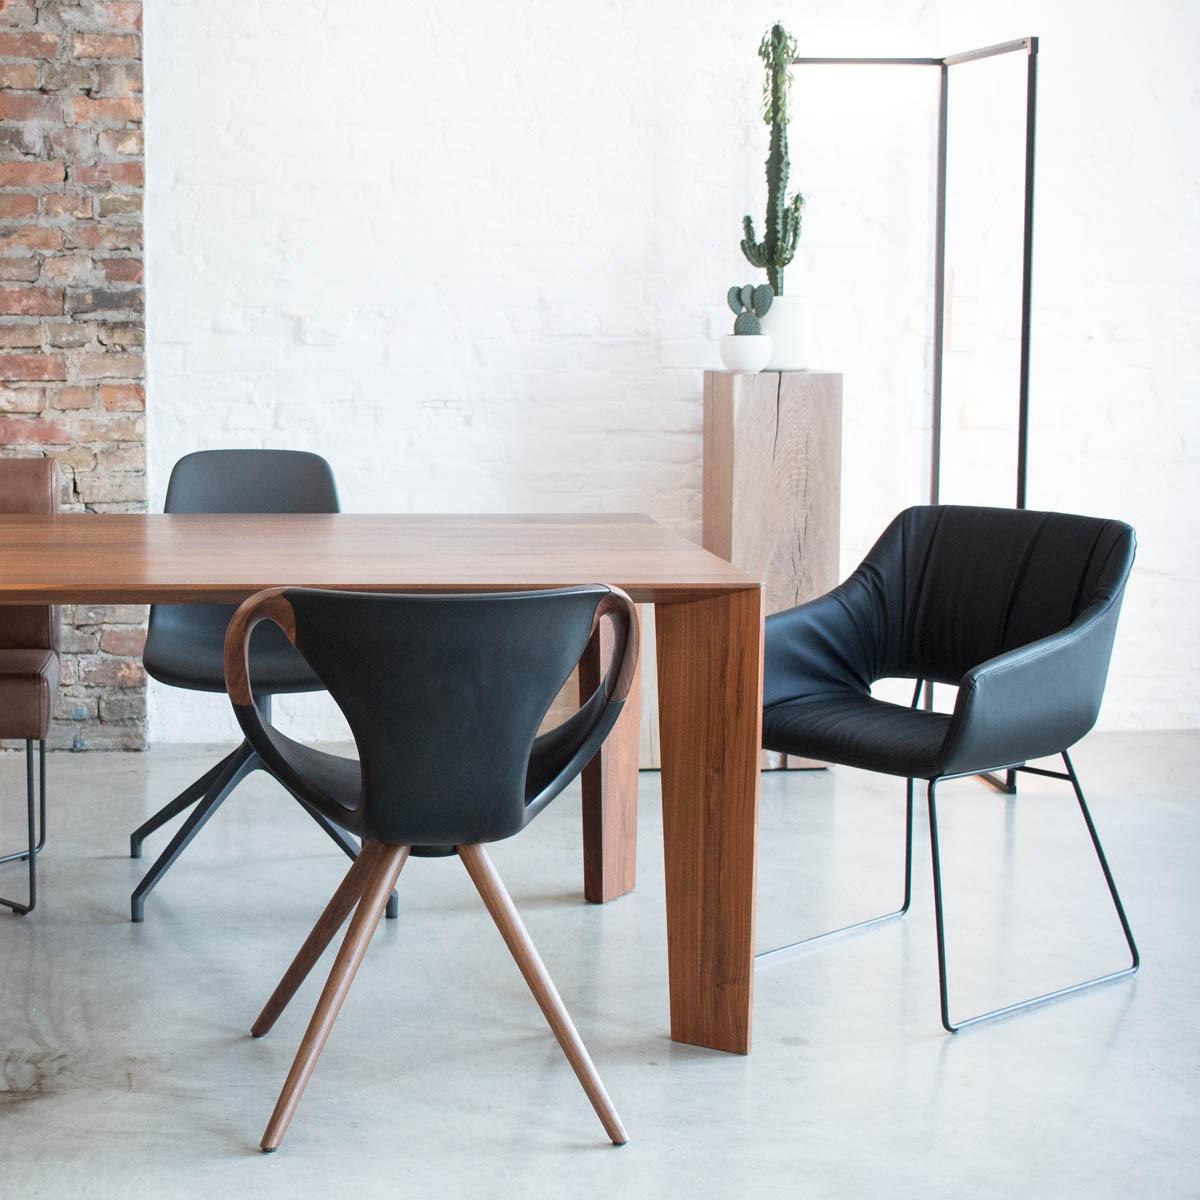 MBzwo Online Möbel Shop Esstisch Bronco